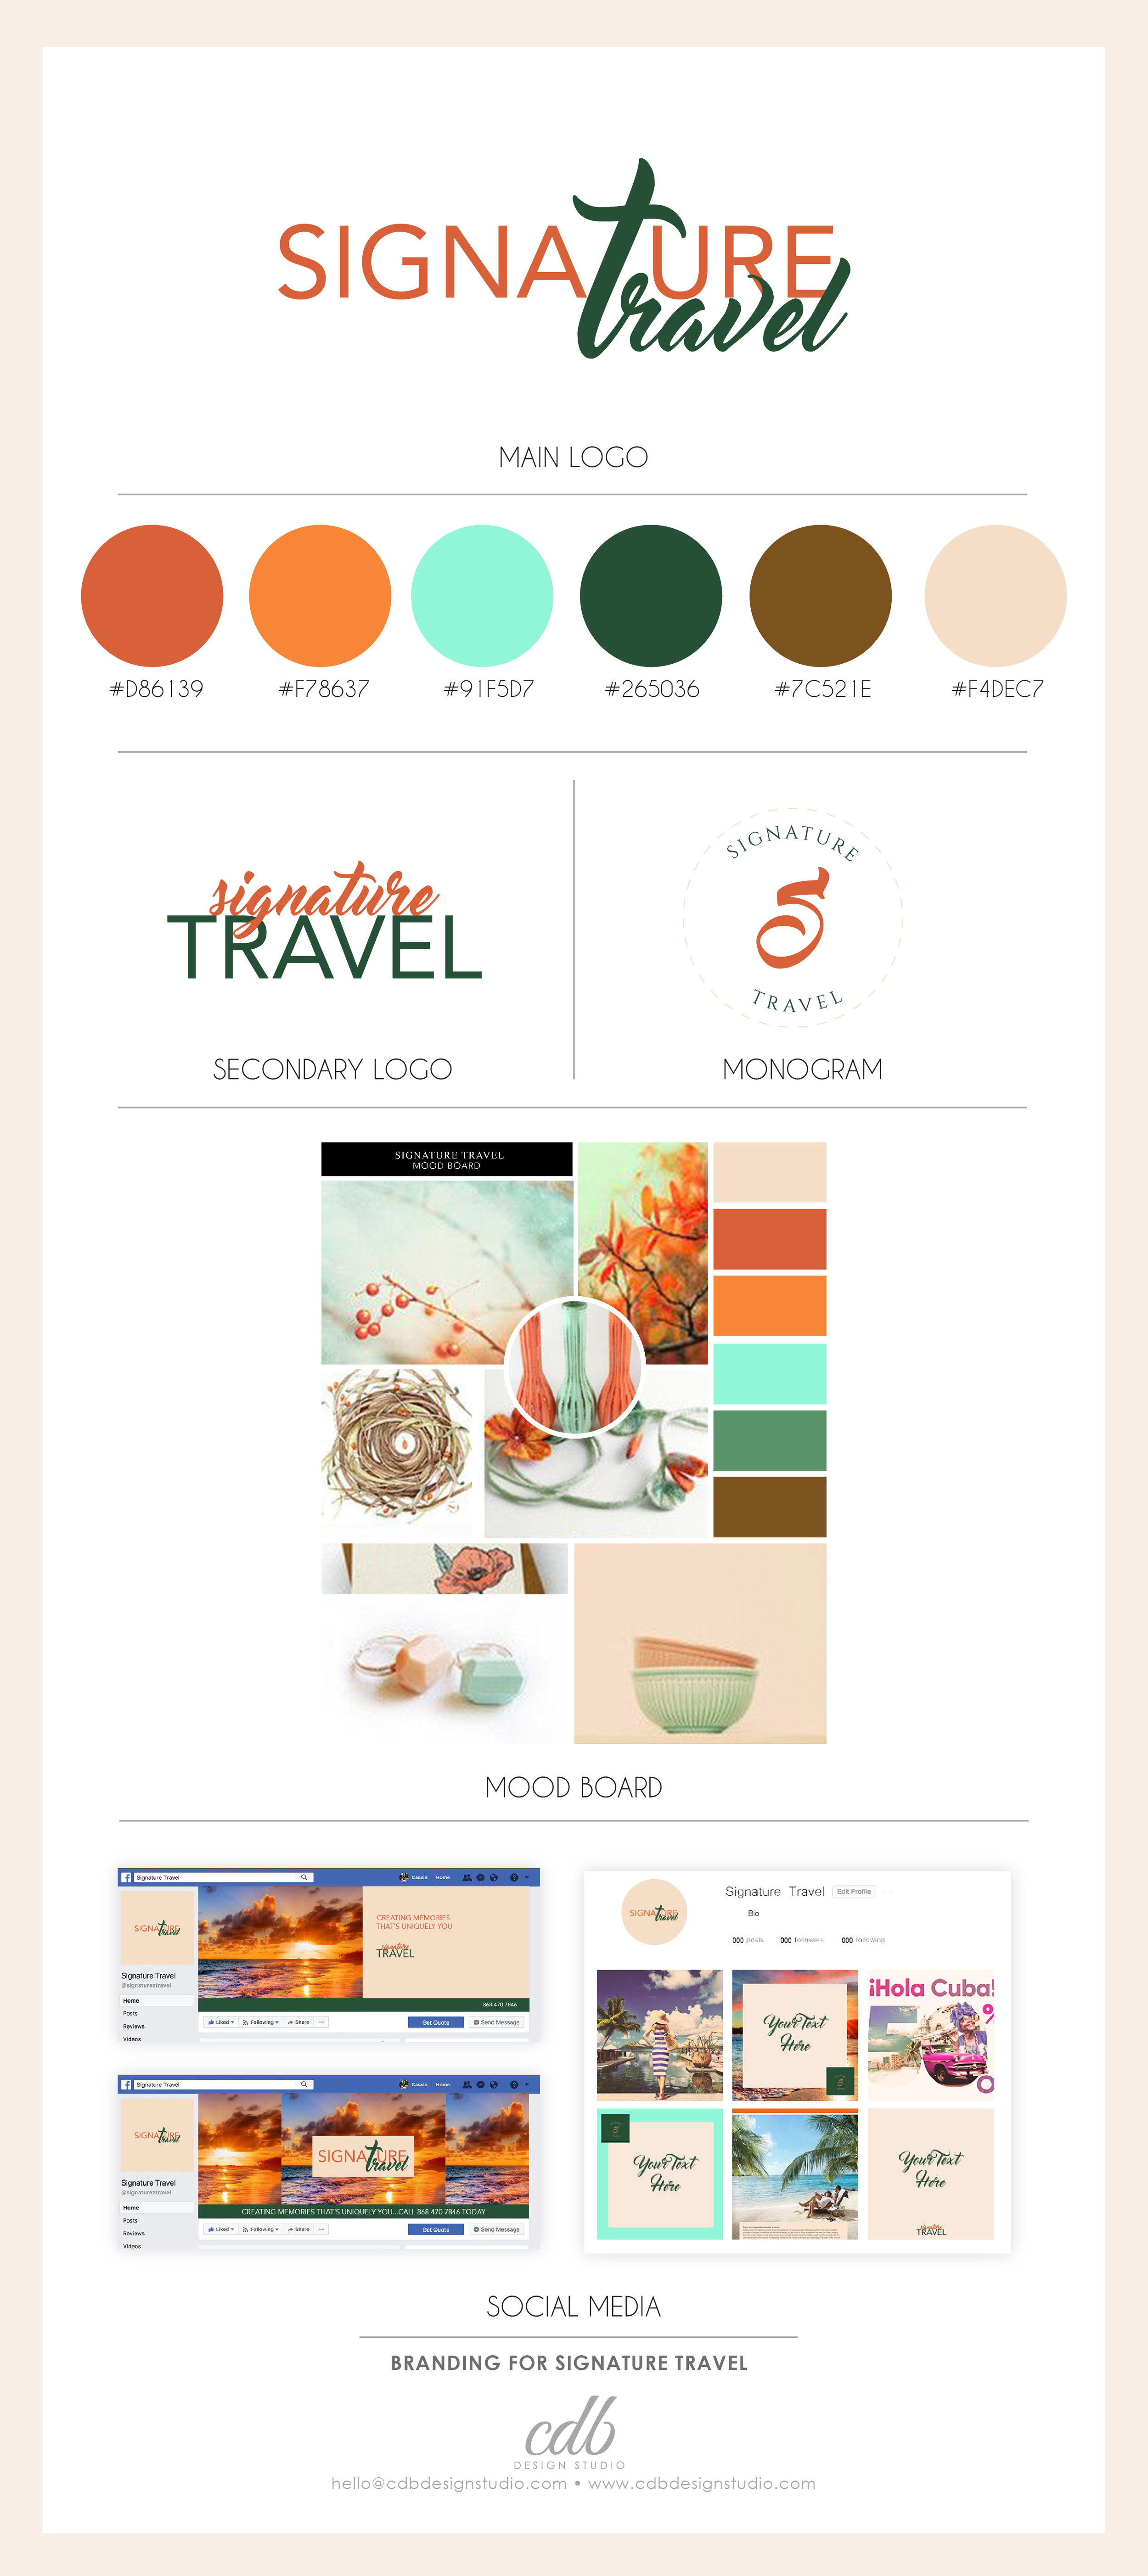 Signature Travel Brand Identity Design Case Study Branding Queen